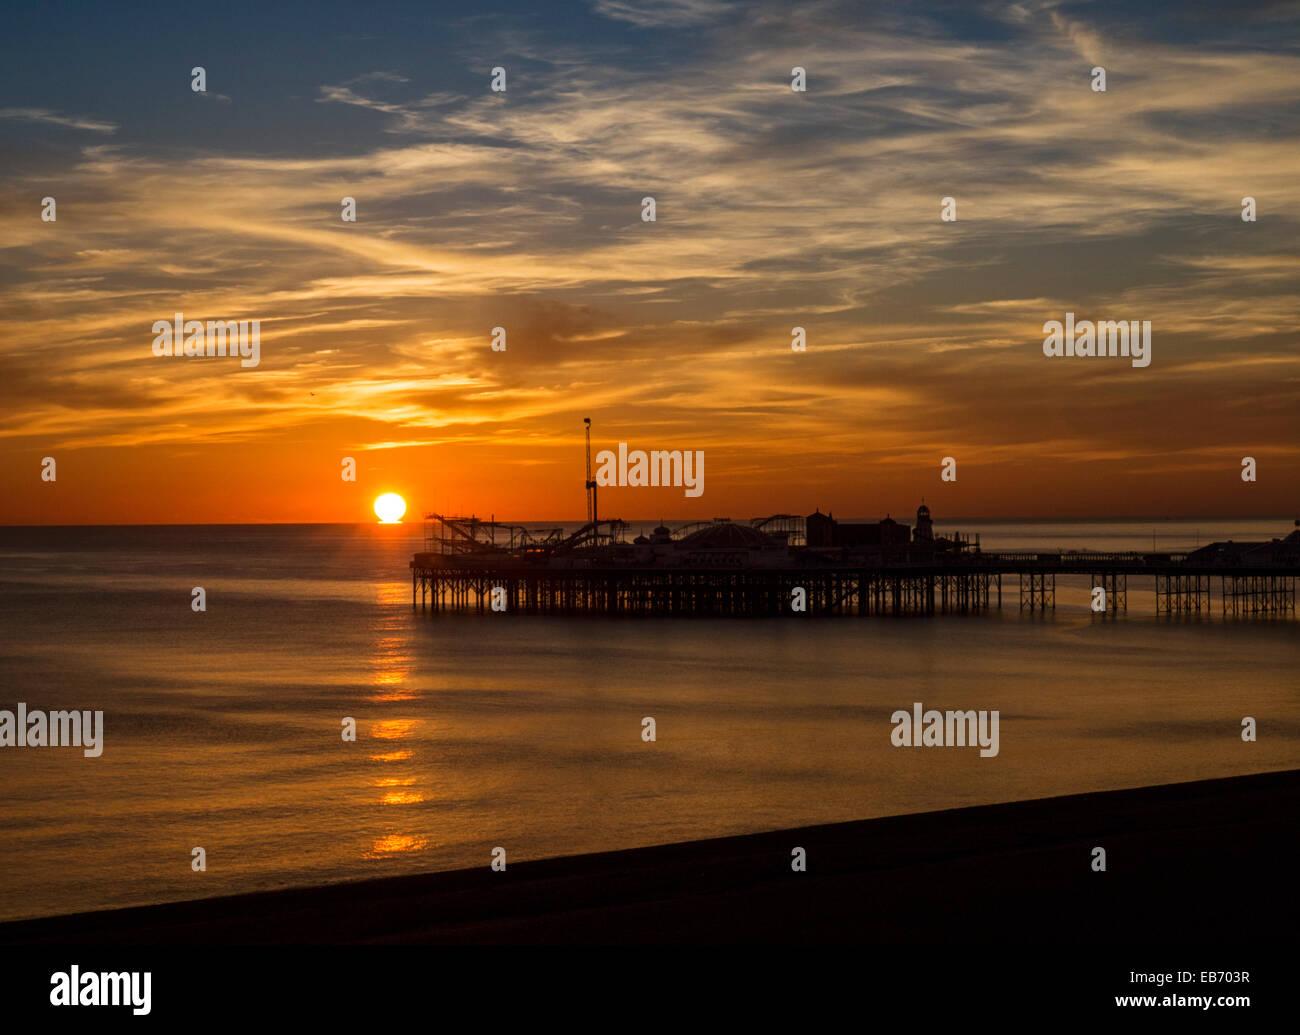 Sunset over Brighton Pier, England, UK - Stock Image